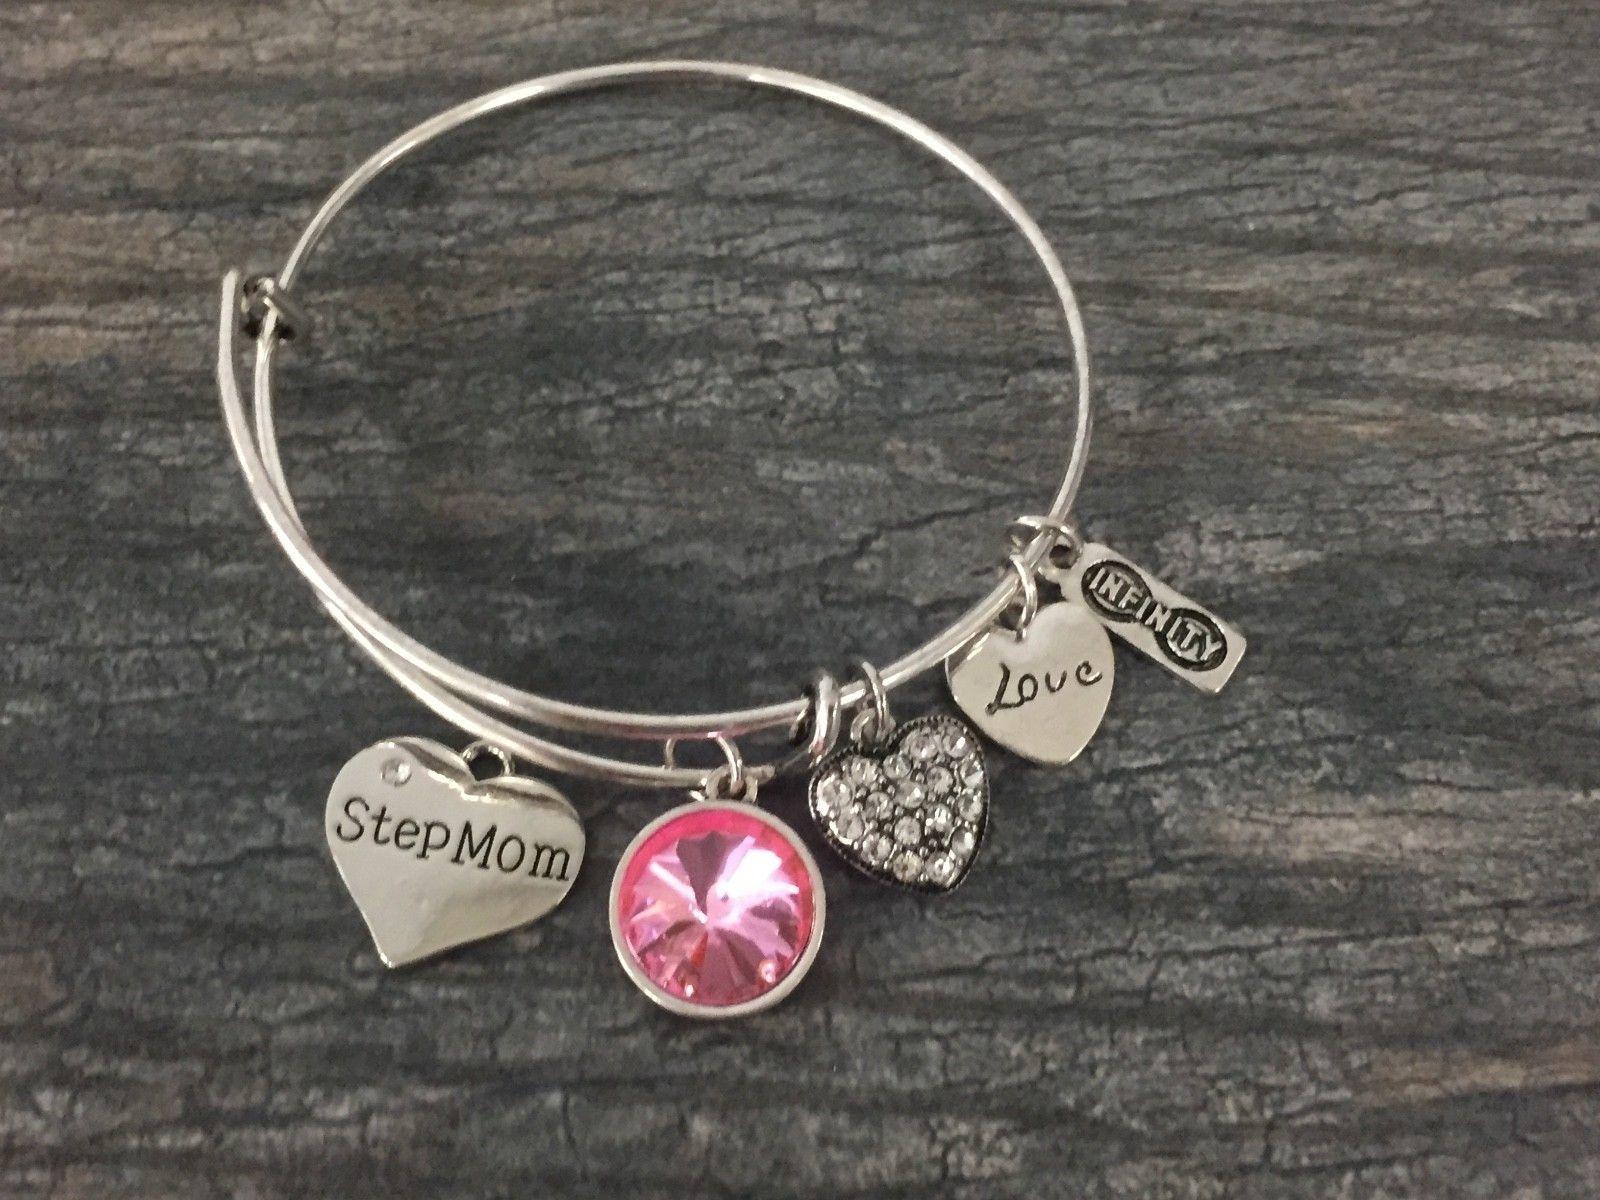 Personalized Grandma Birthstone Charm Bangle Bracelet, Mothers Day Jewelry Gift - $15.00